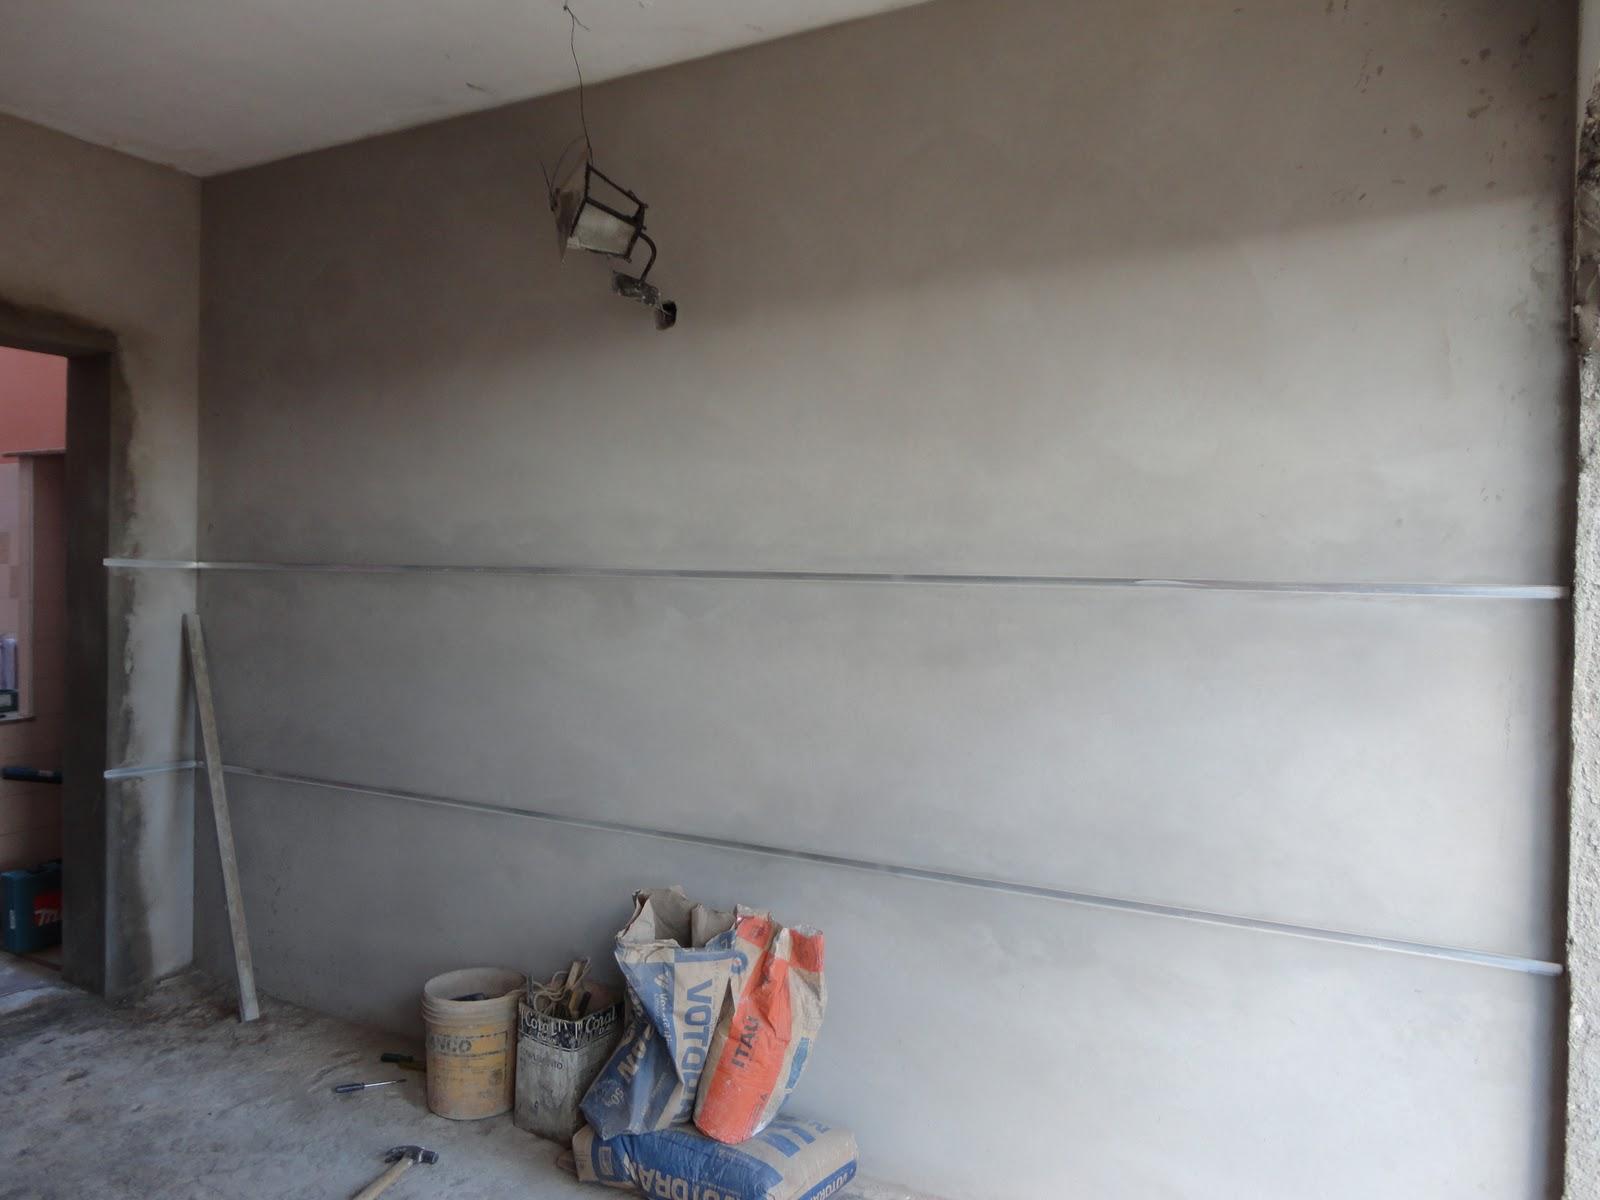 #894B42 reforma de nossa casa: 12/01/2011 01/01/2012 1096 Portas E Janelas De Aluminio Na Leroy Merlin